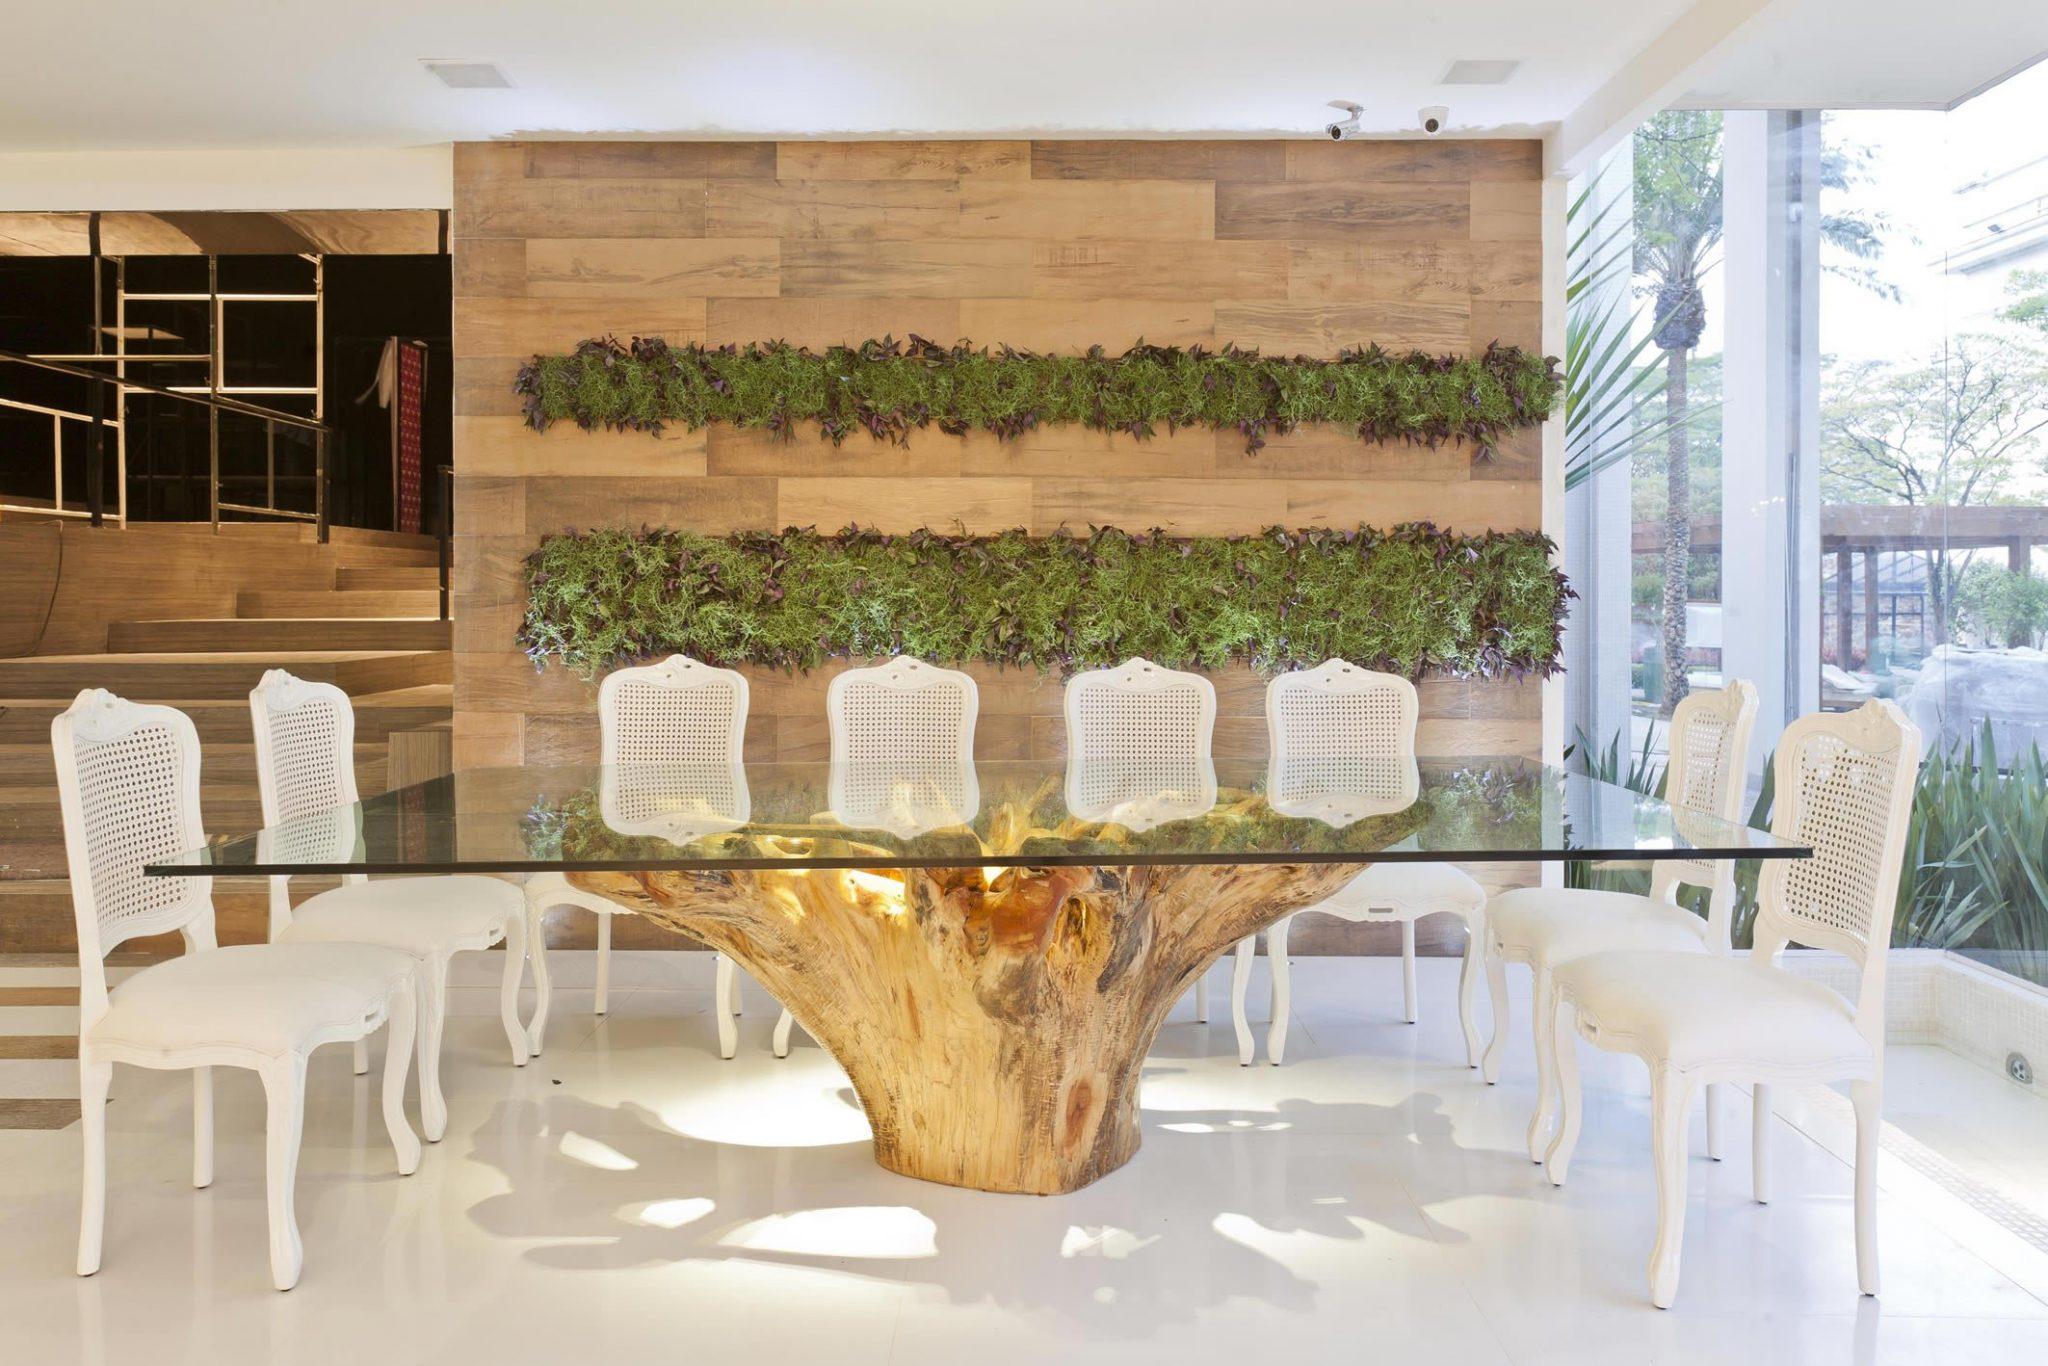 mesa de comedor original | Hoy LowCost